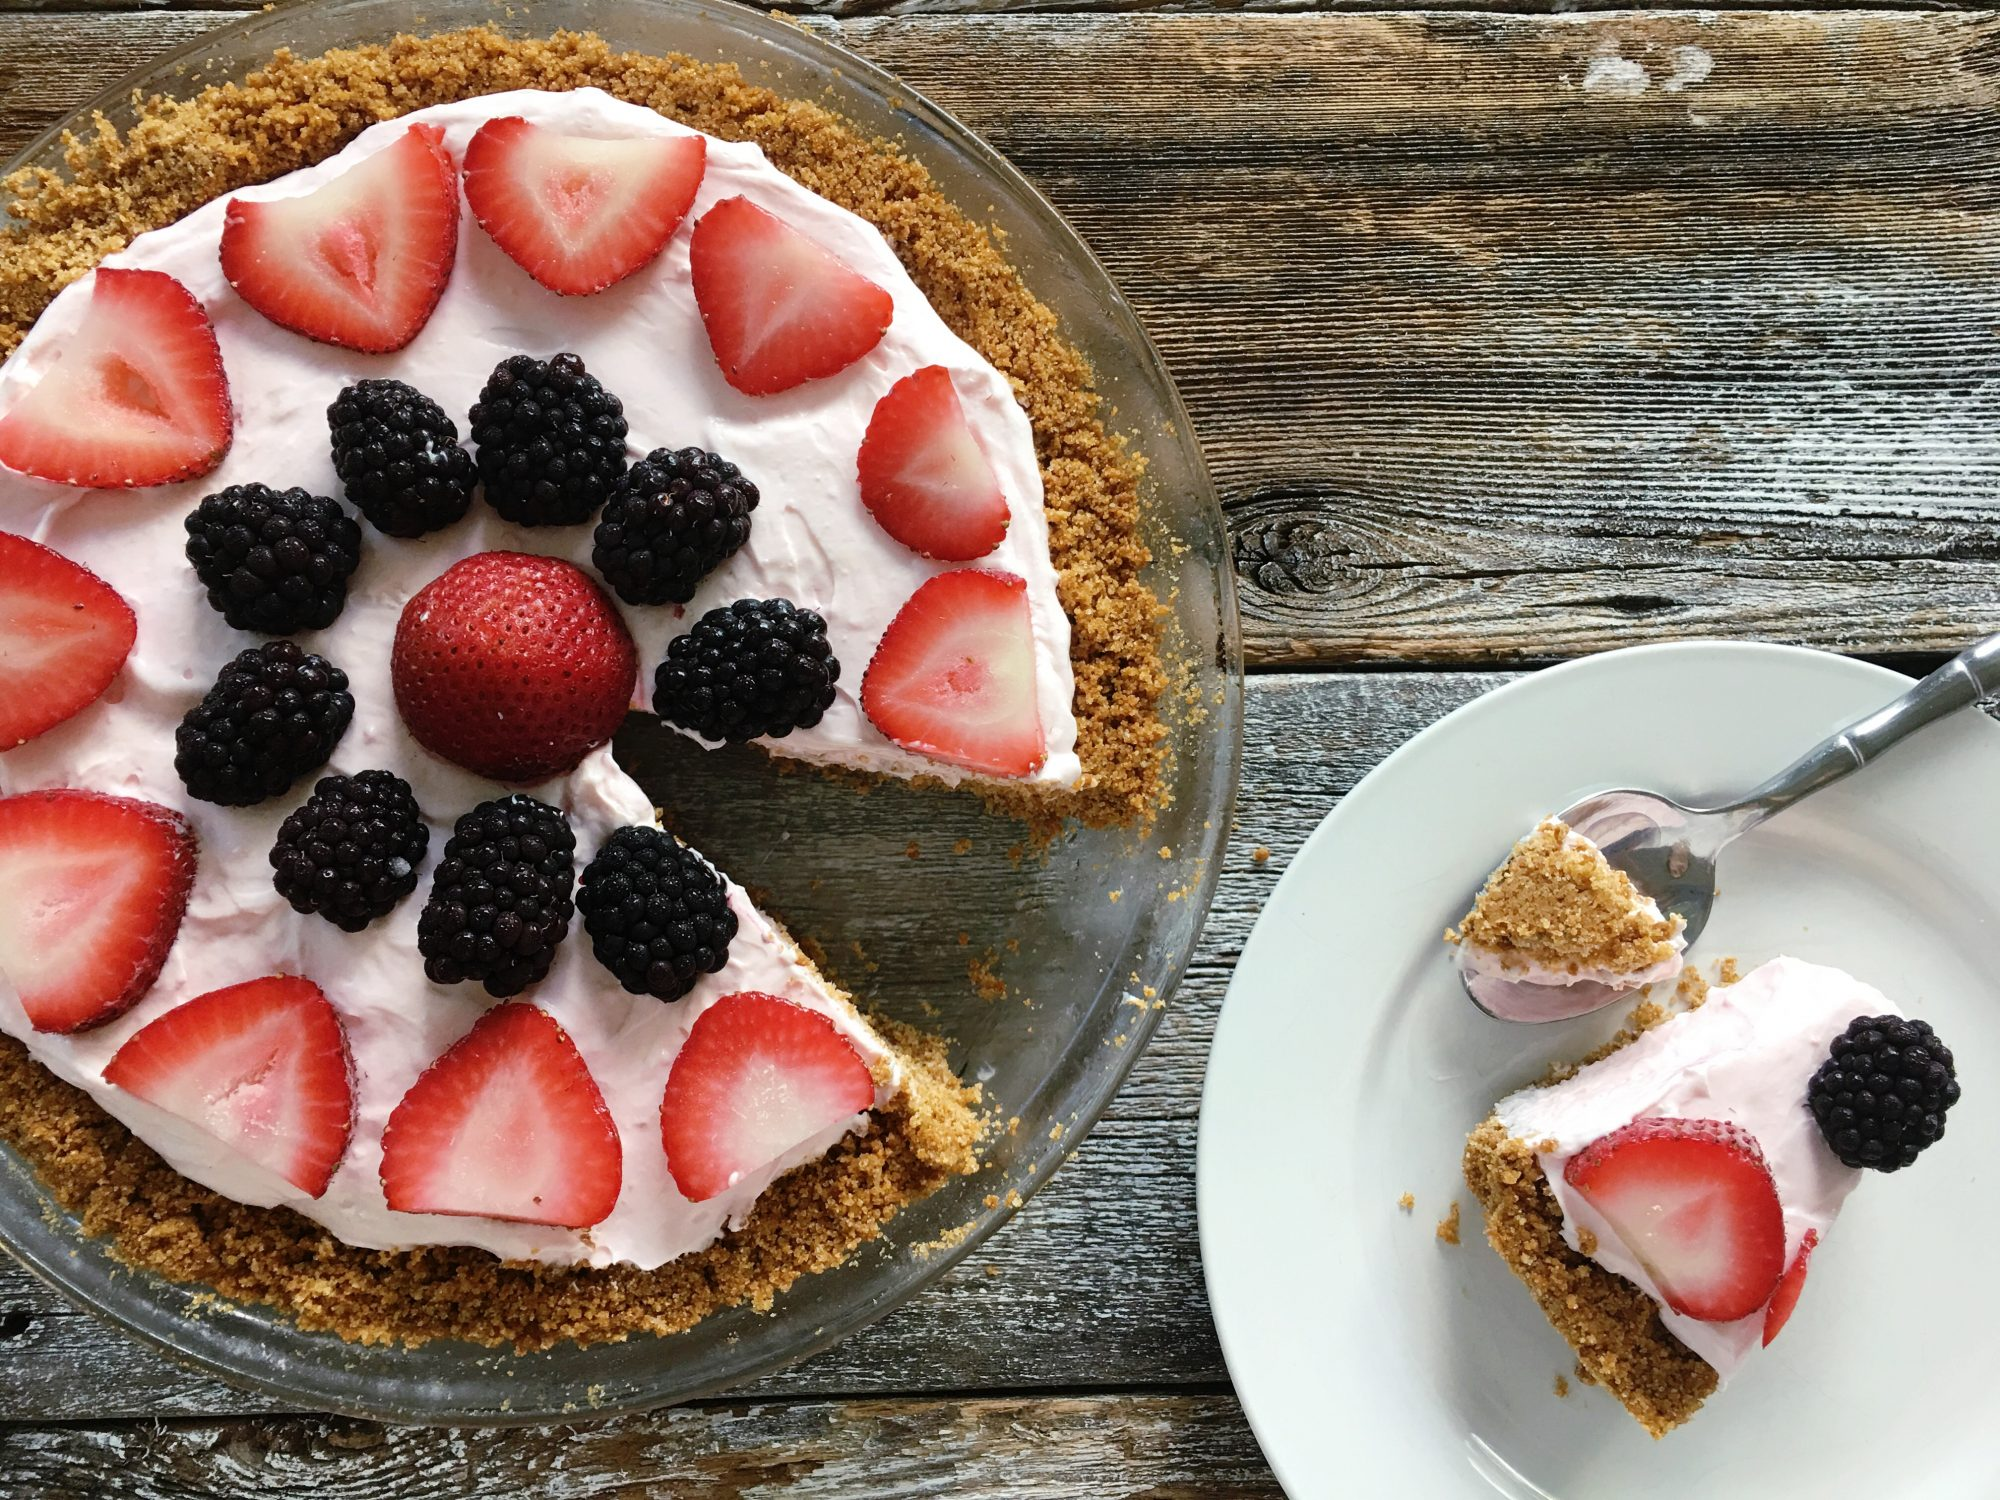 Strawberry Yogurt Cream Pie with Cereal Crust